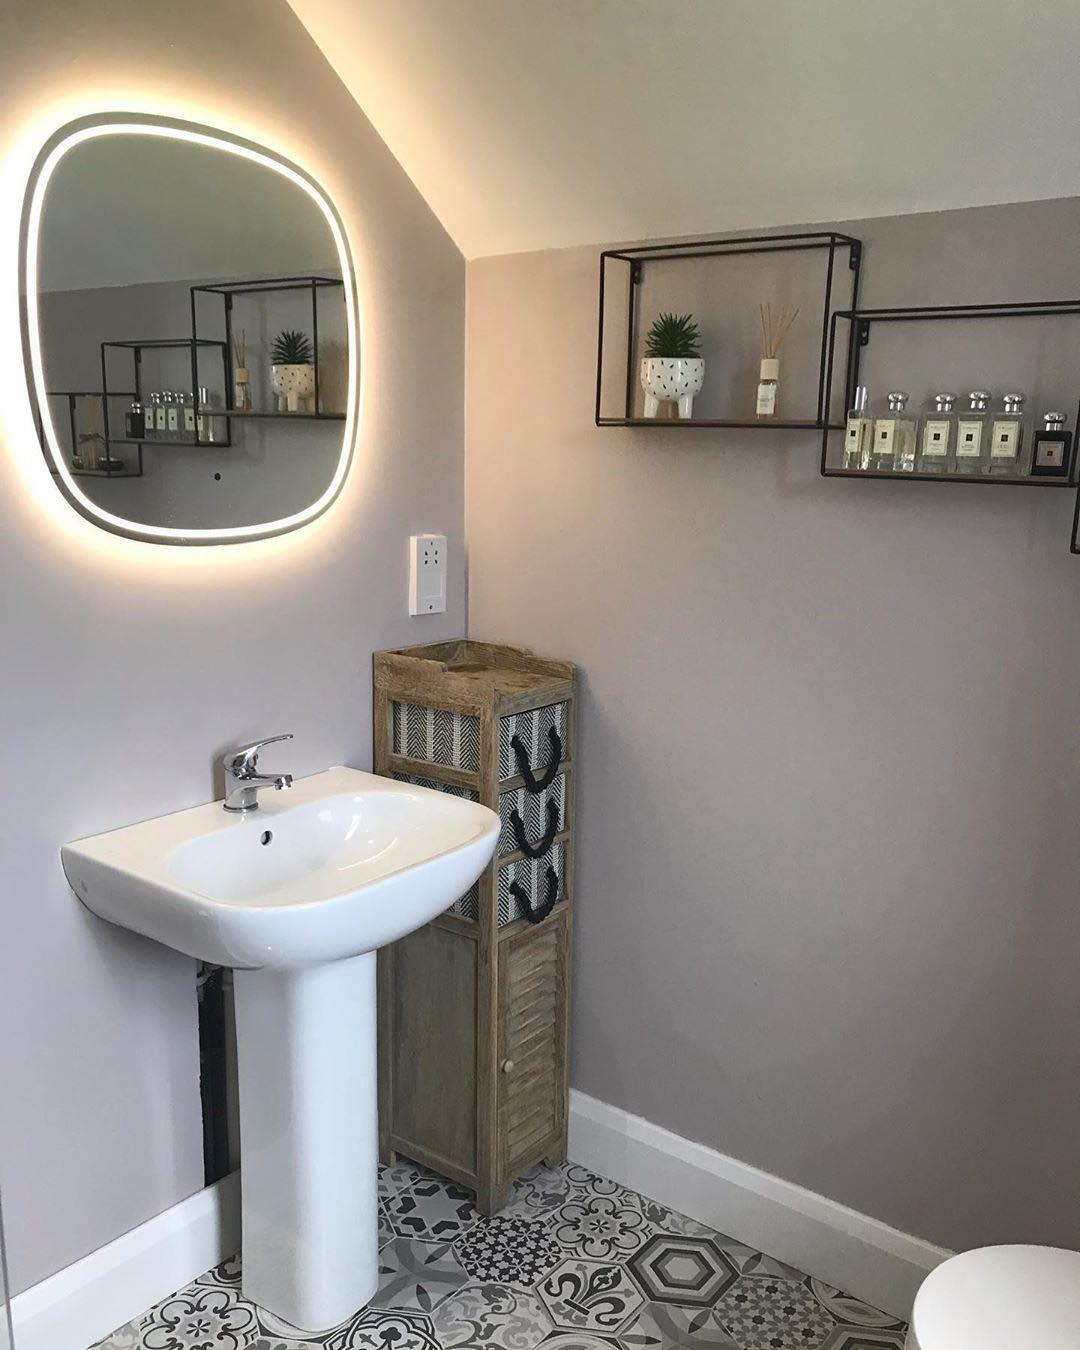 LED ogledalo oble ivice 70x60 kupatila online